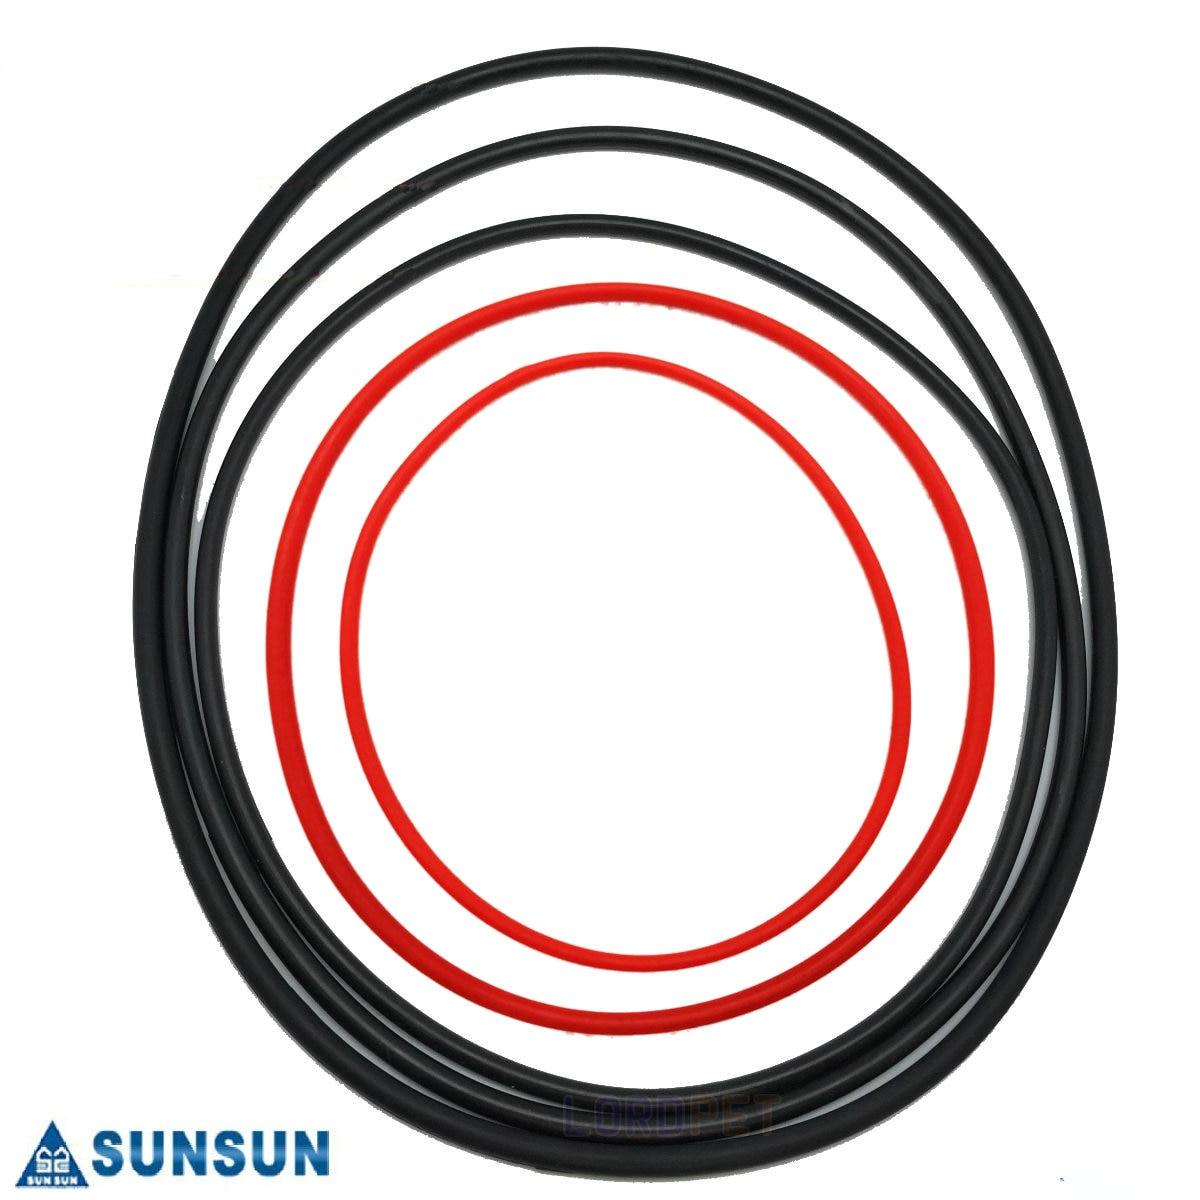 SUNSUN Kanister Filter Dichtung Ring Ersetzen O Ring Für HW 602 602B 603 603B 3/4/702AB 3 /4/703AB 3/4/704AB HW3000